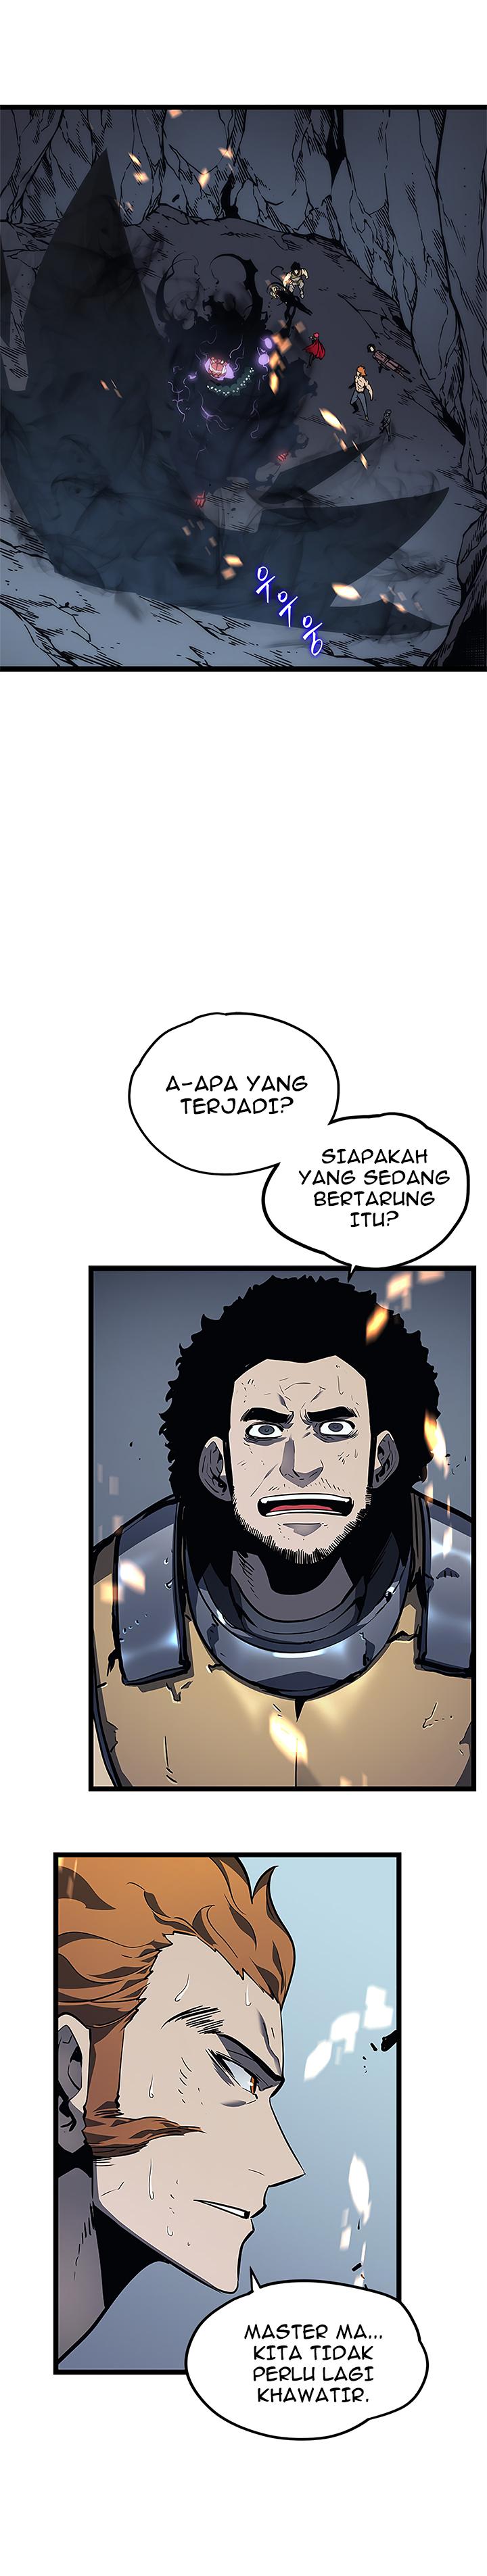 Komik Solo Leveling  Chapter 101 gambar urutan 19